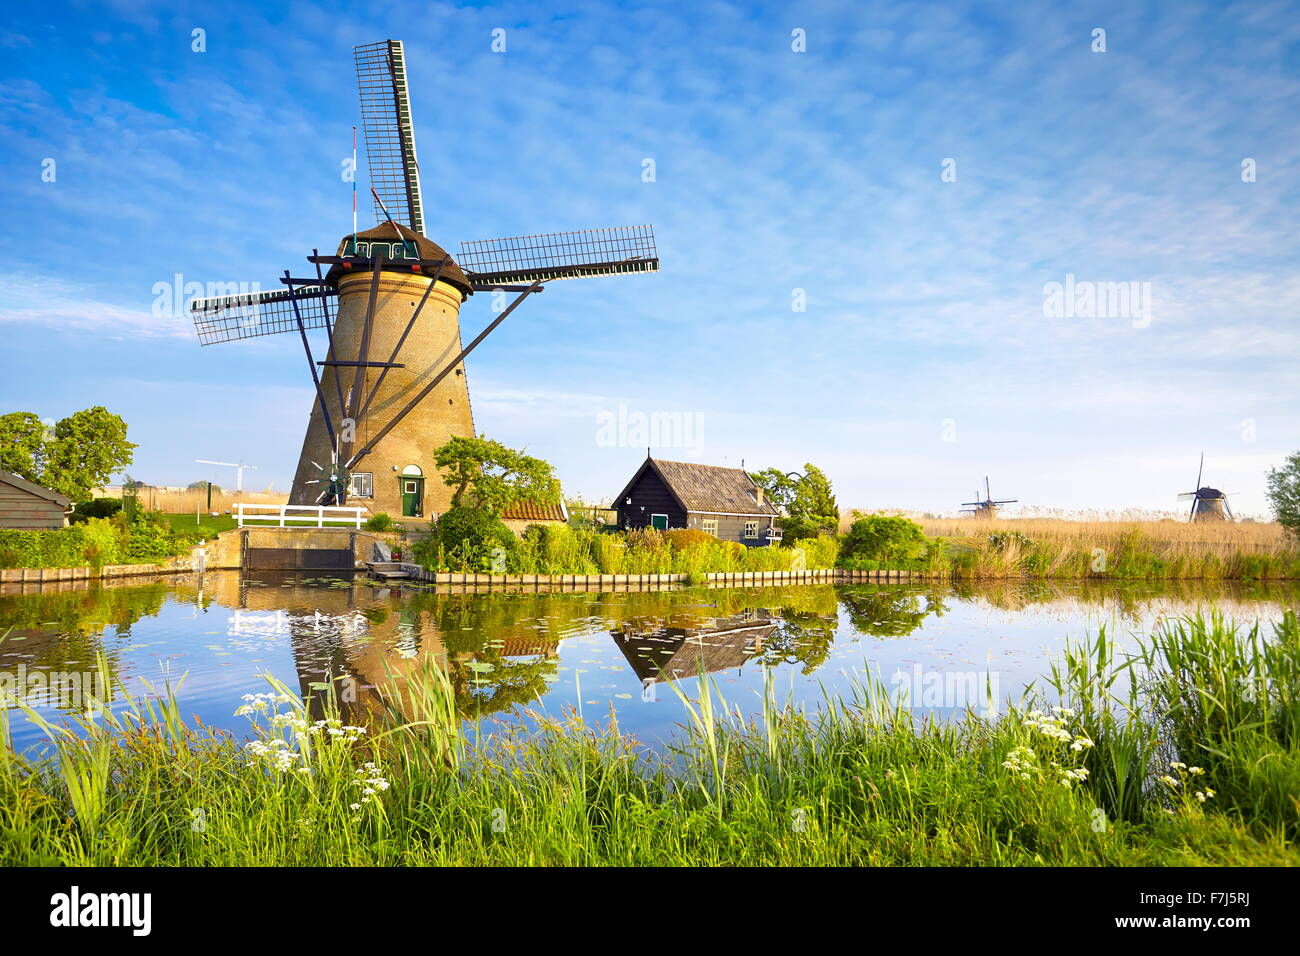 Kinderdijk windmills - Holland Netherlands - Stock Image